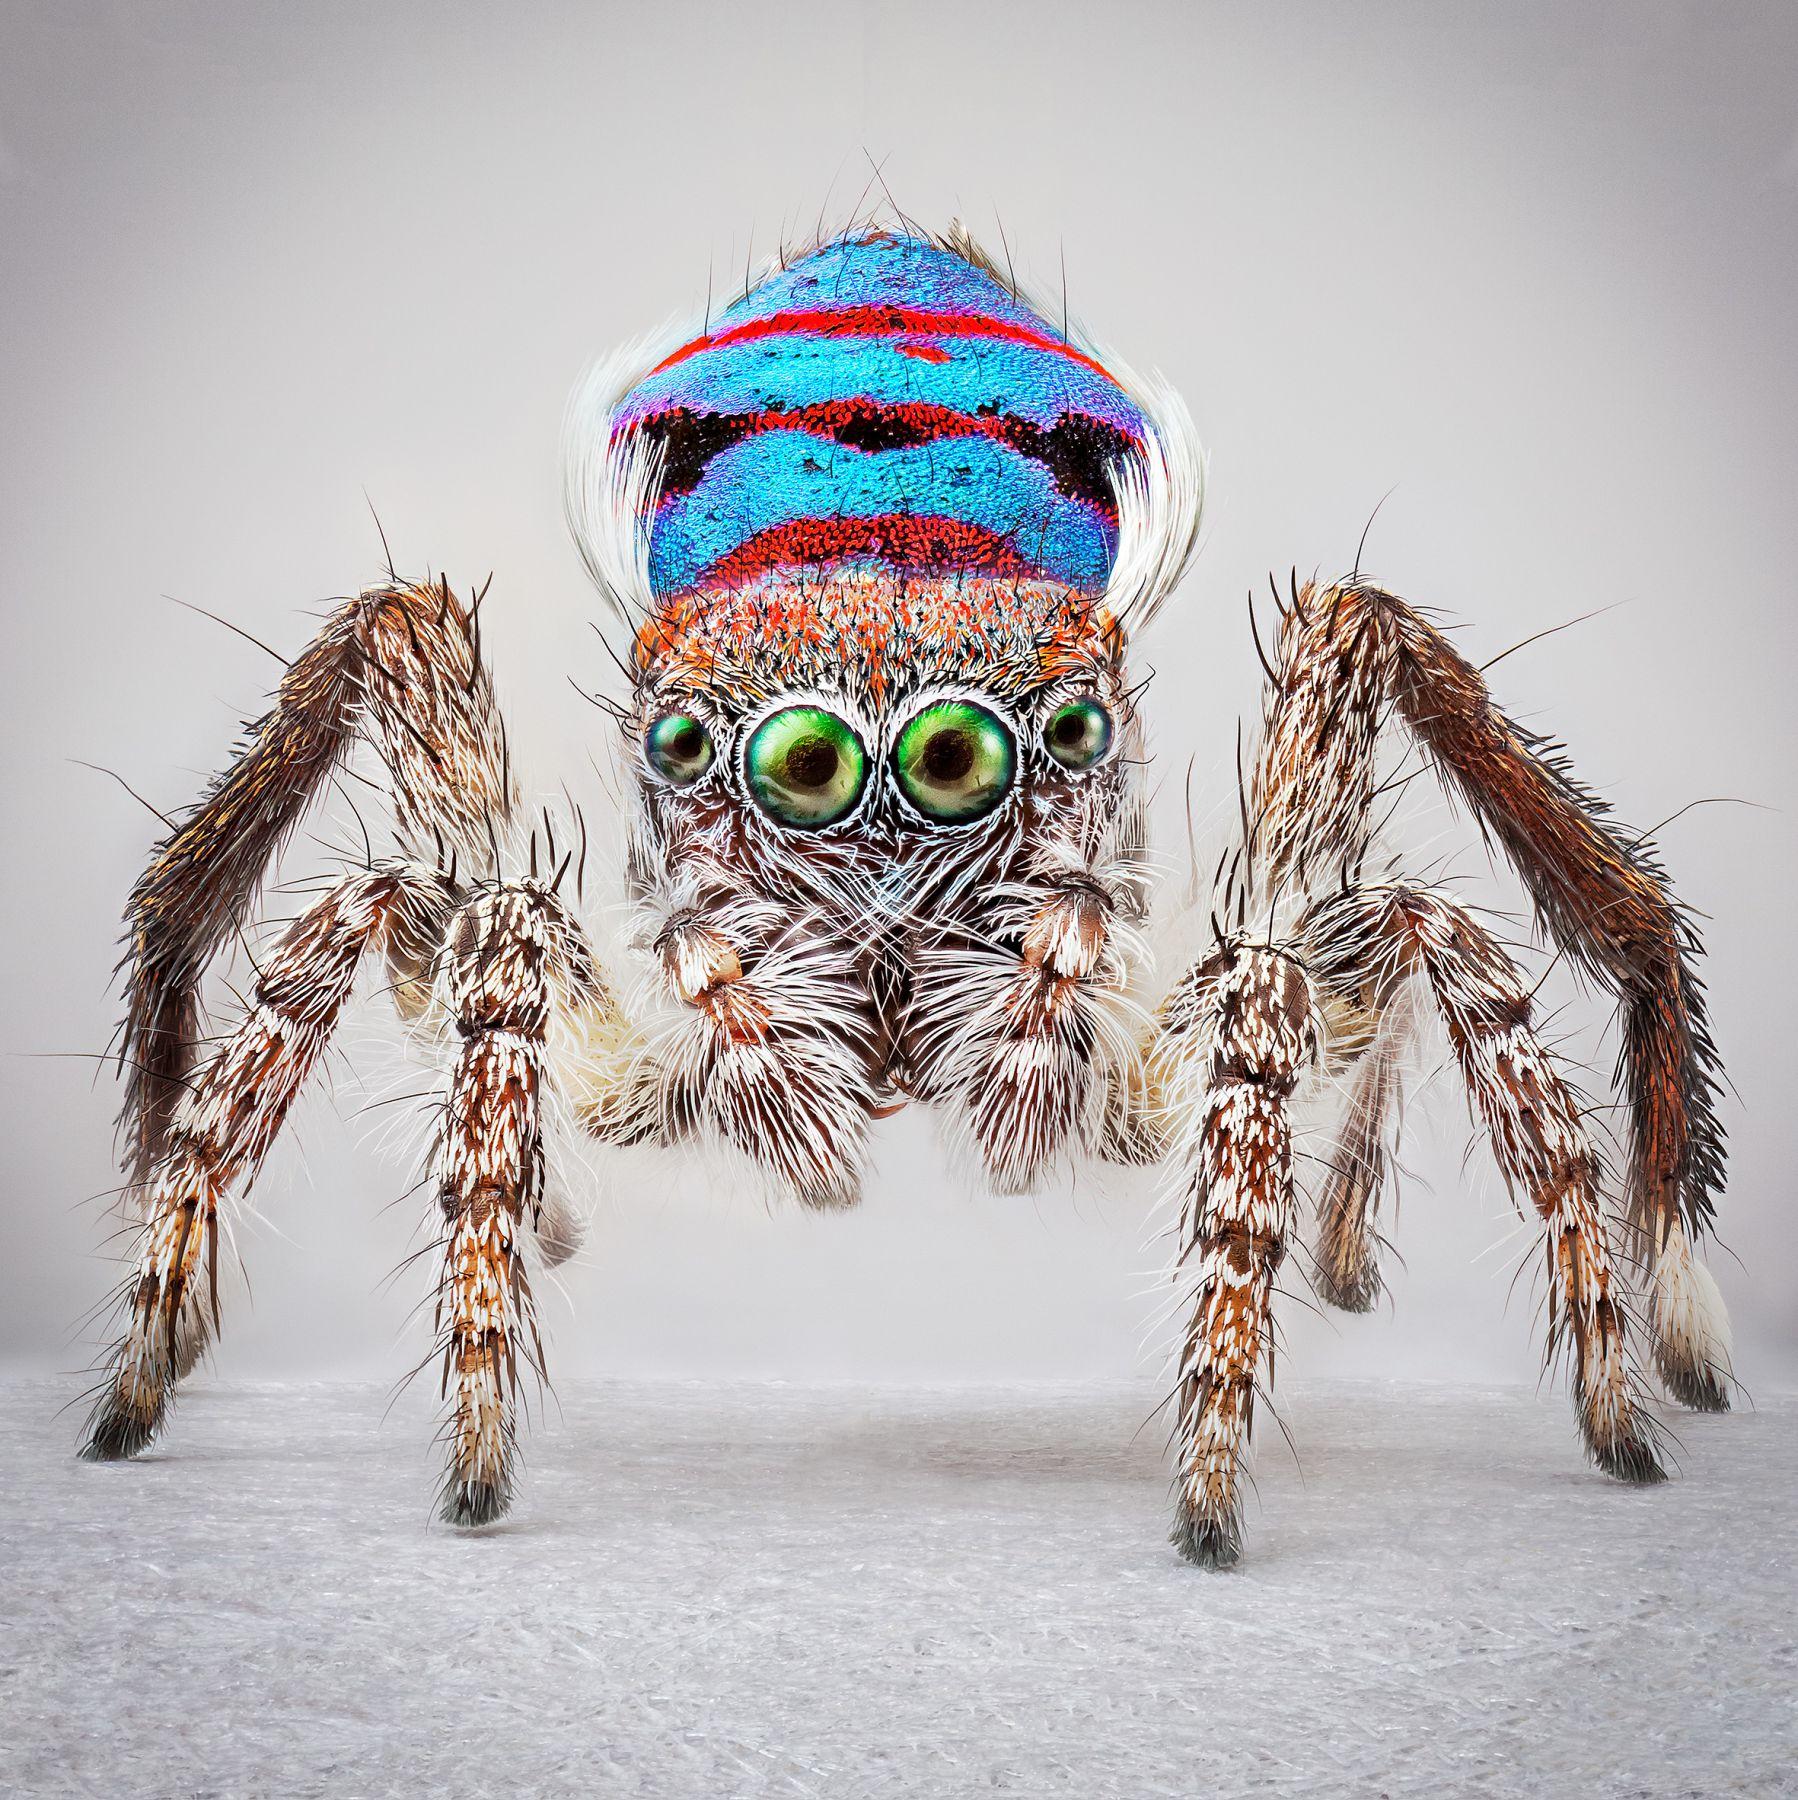 Maria Fernanda Cardoso,Spiders of Paradise: Maratus speciosus from the Actual Size III. Ed. 3/5 [Ed. 5 + 2AP], 2018,Deep focus microscopy, pigment print on premium photo paper,60 x 60 in. (152.4 x 152.4 cm.)